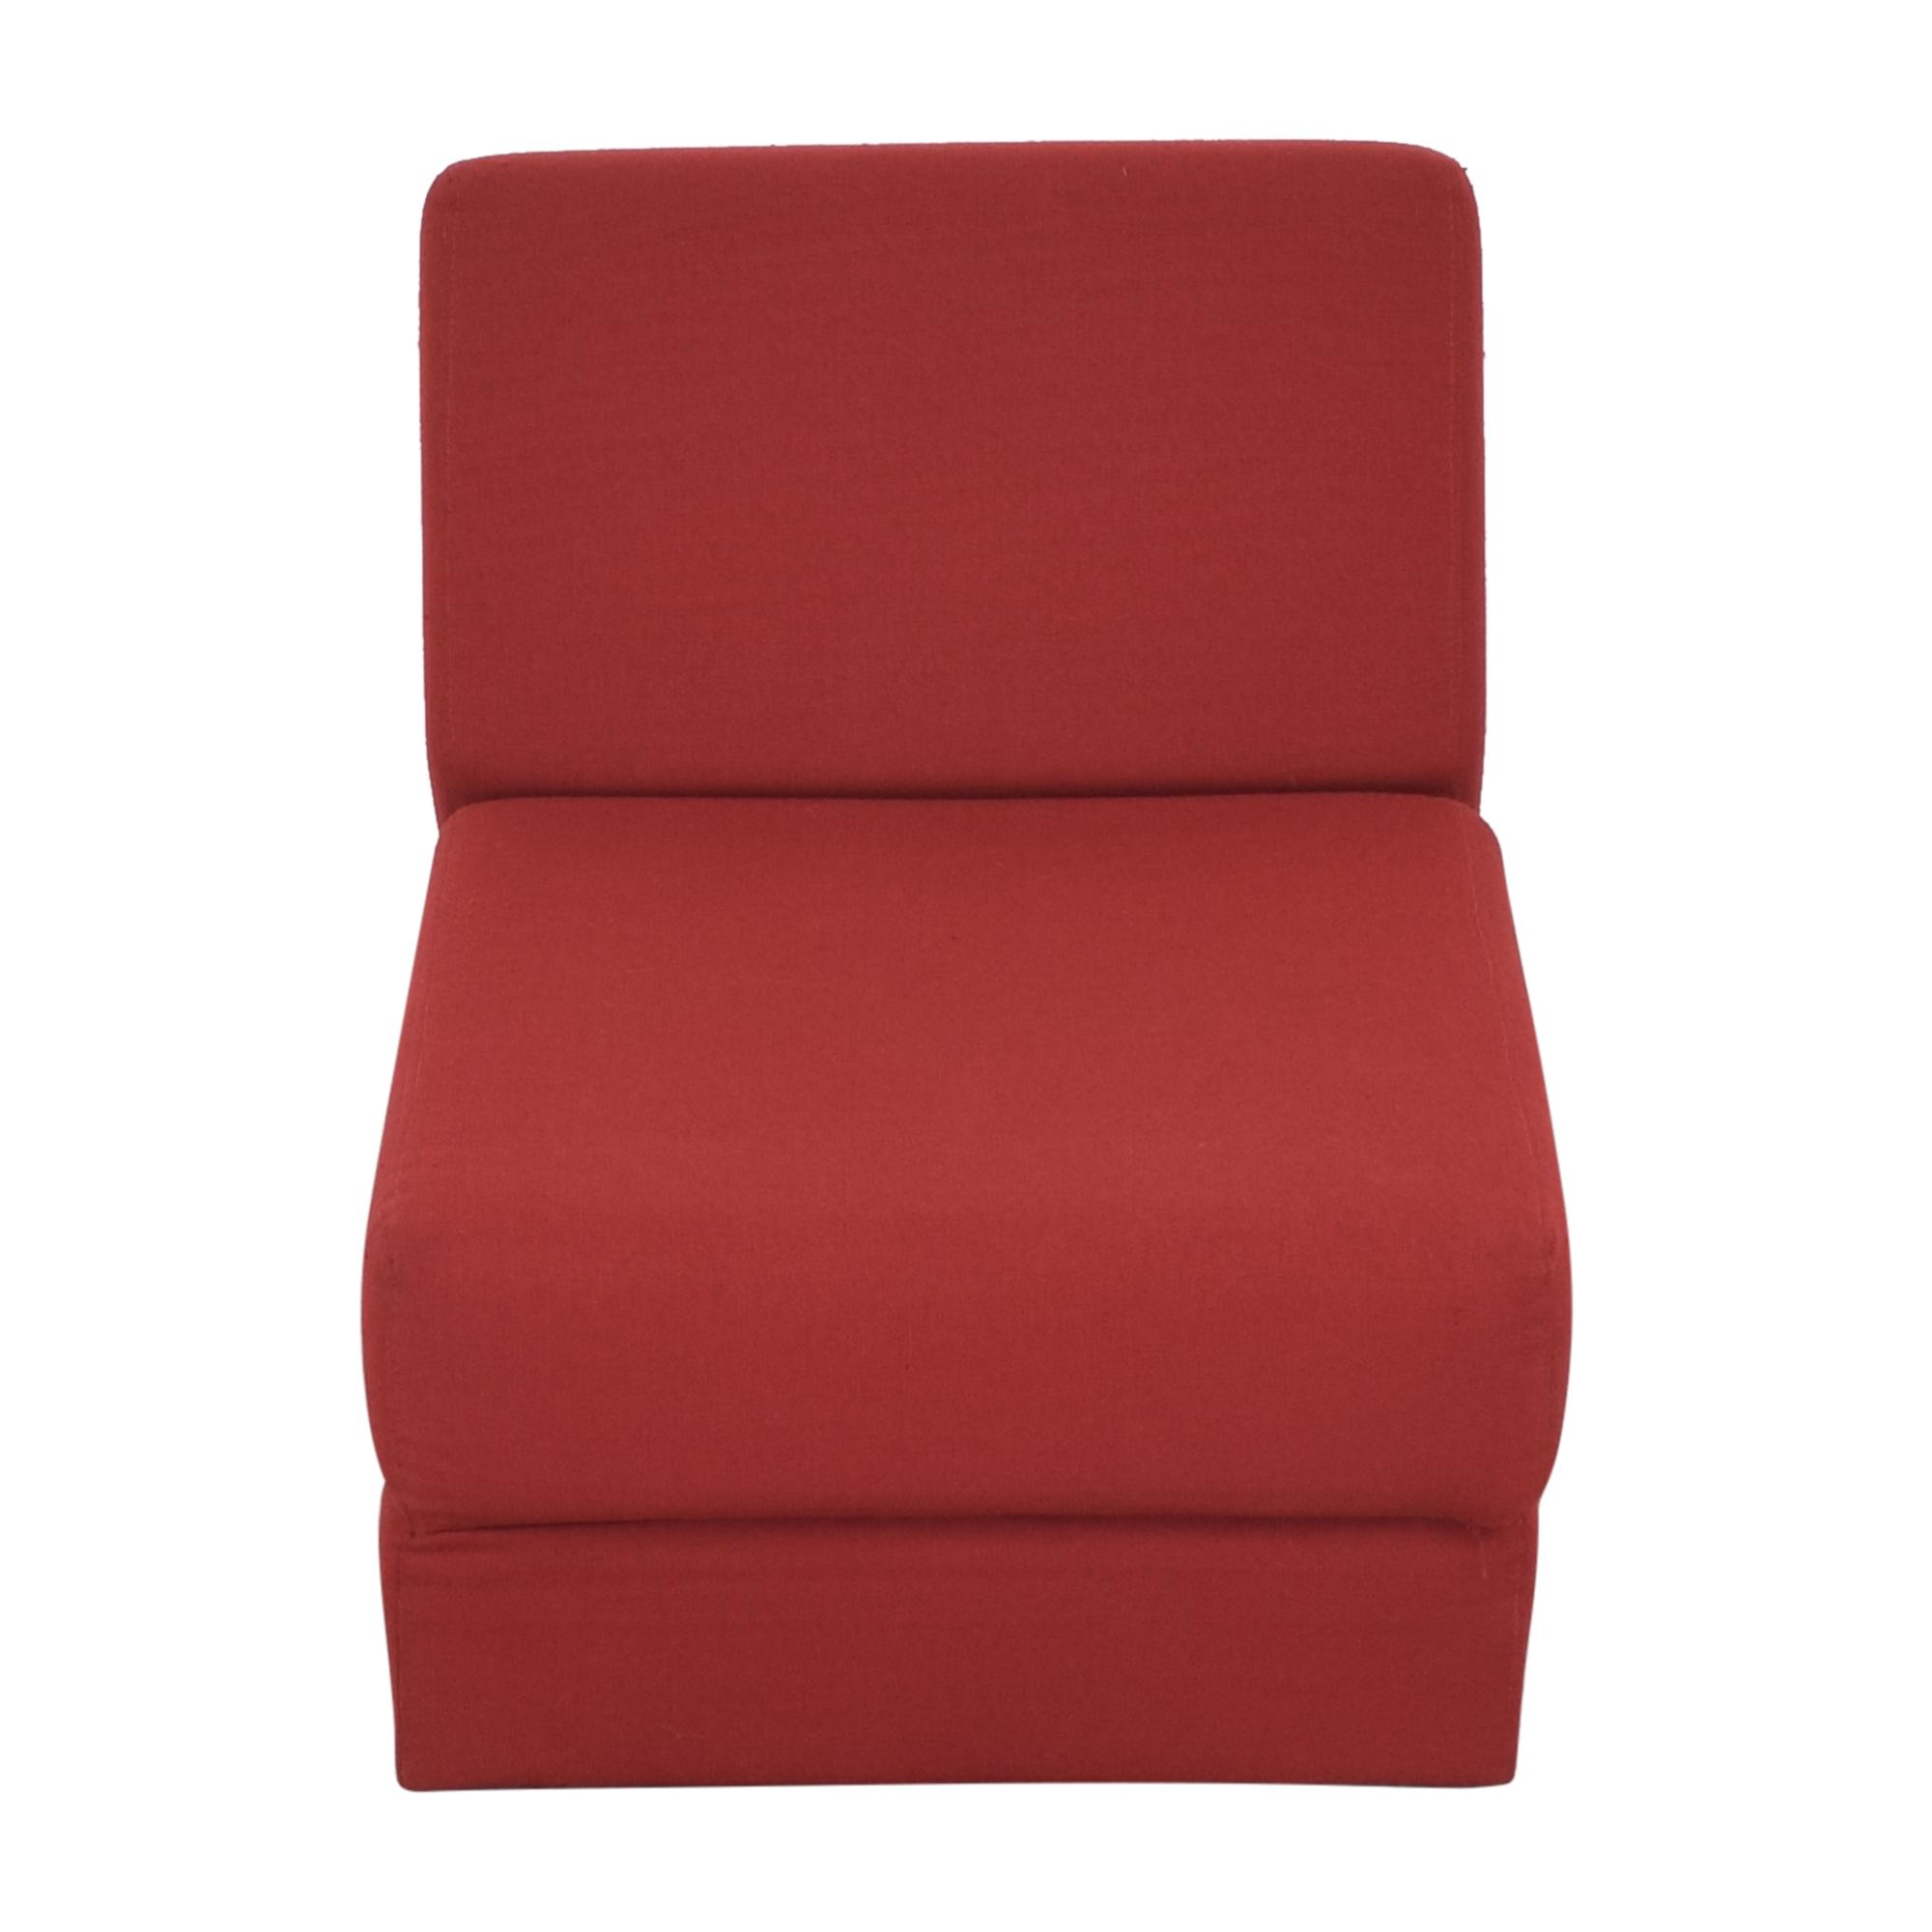 Lazzoni Lazzoni Mini Seat Packing Sofa Bed on sale